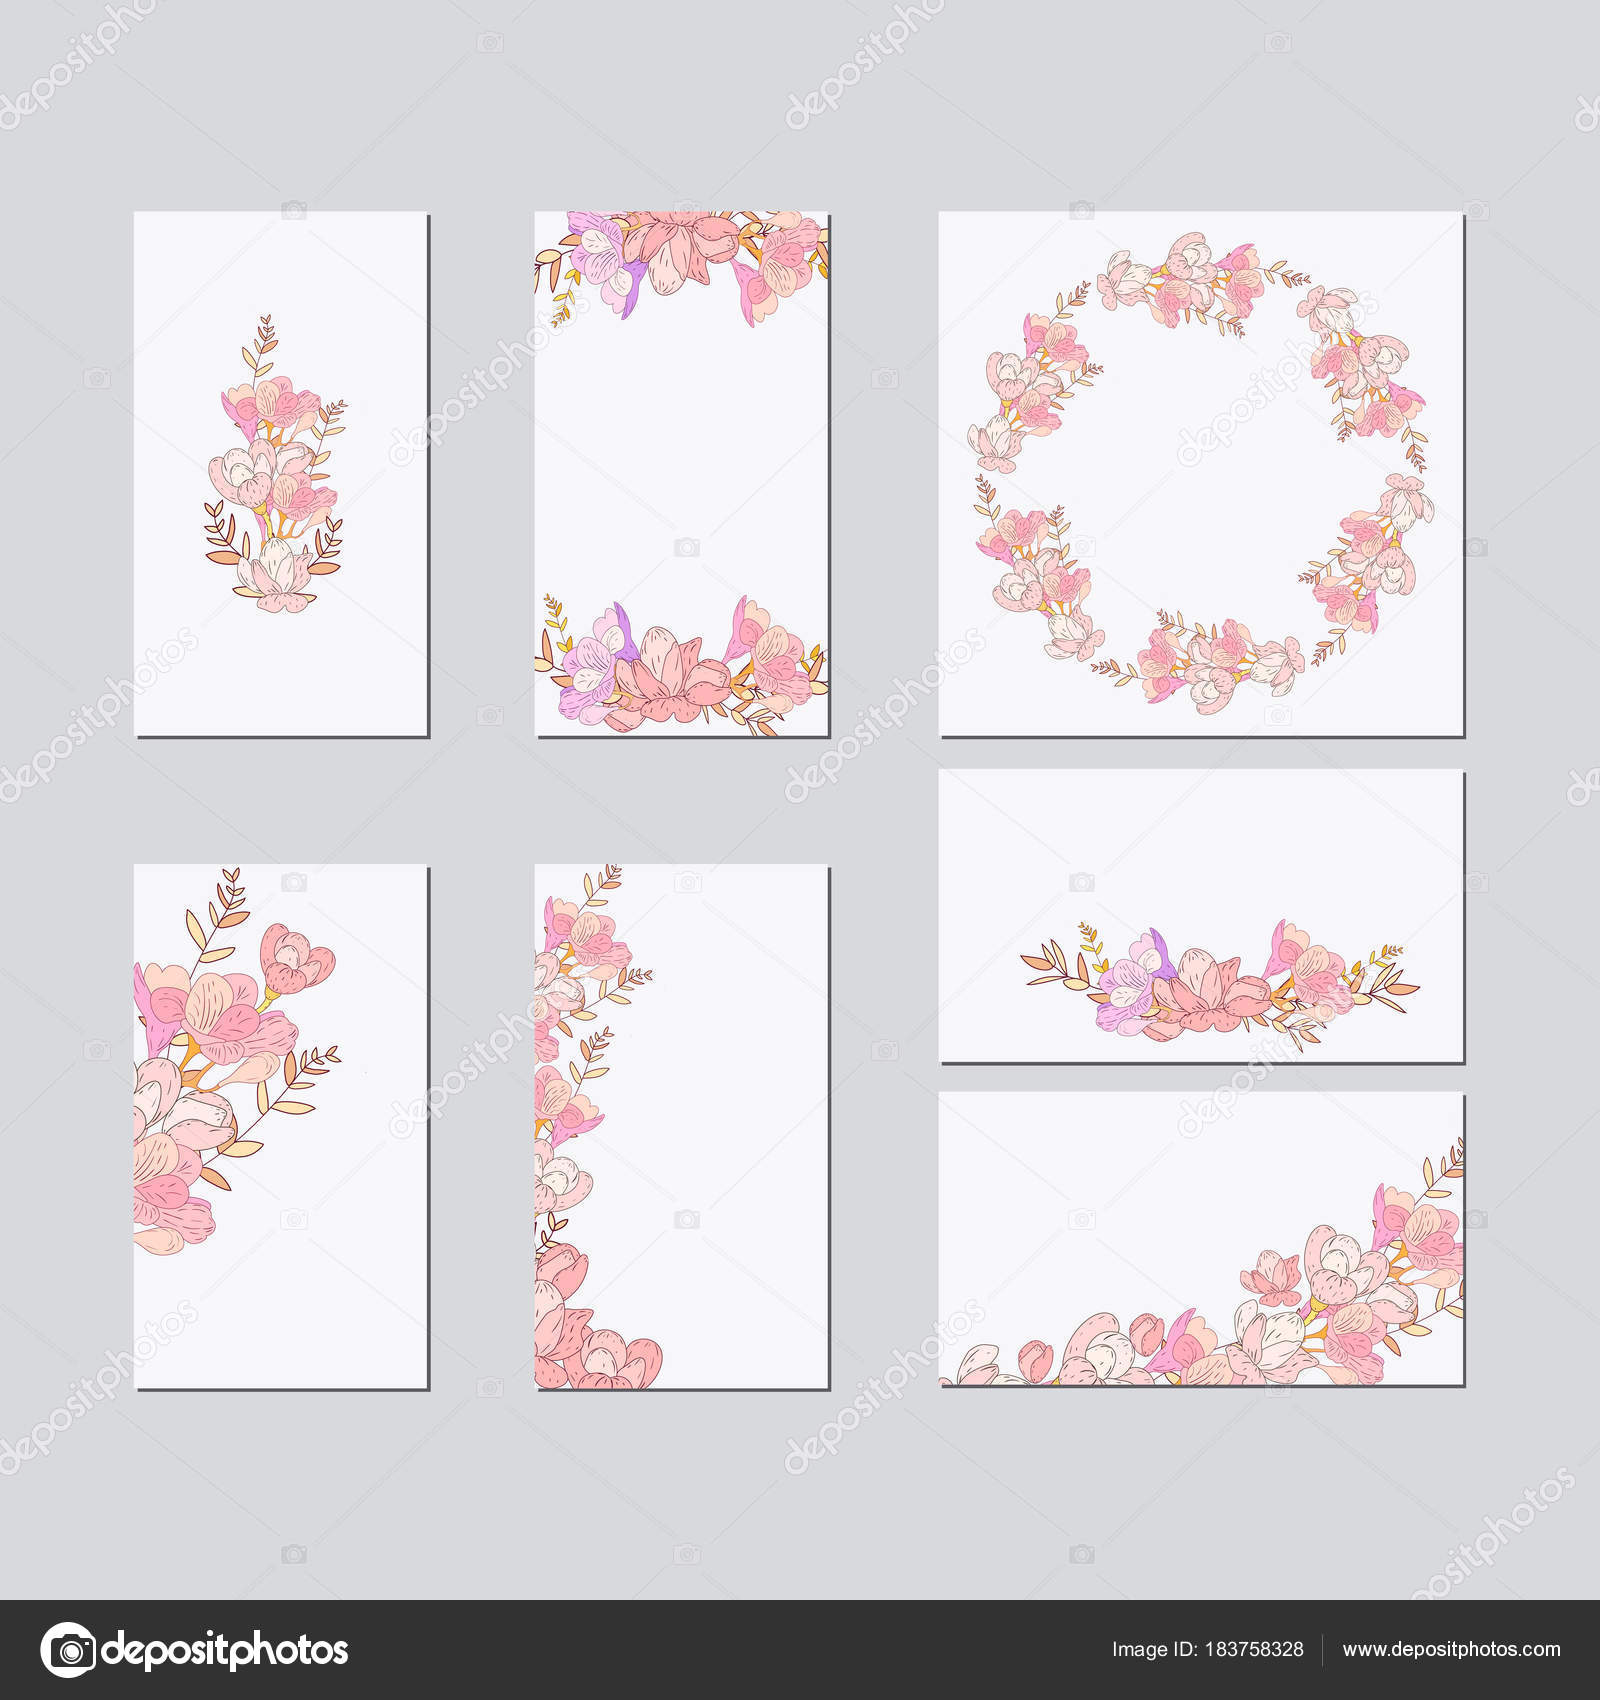 Colorful Greeting Wedding Invitation Card Illustration Set Flower